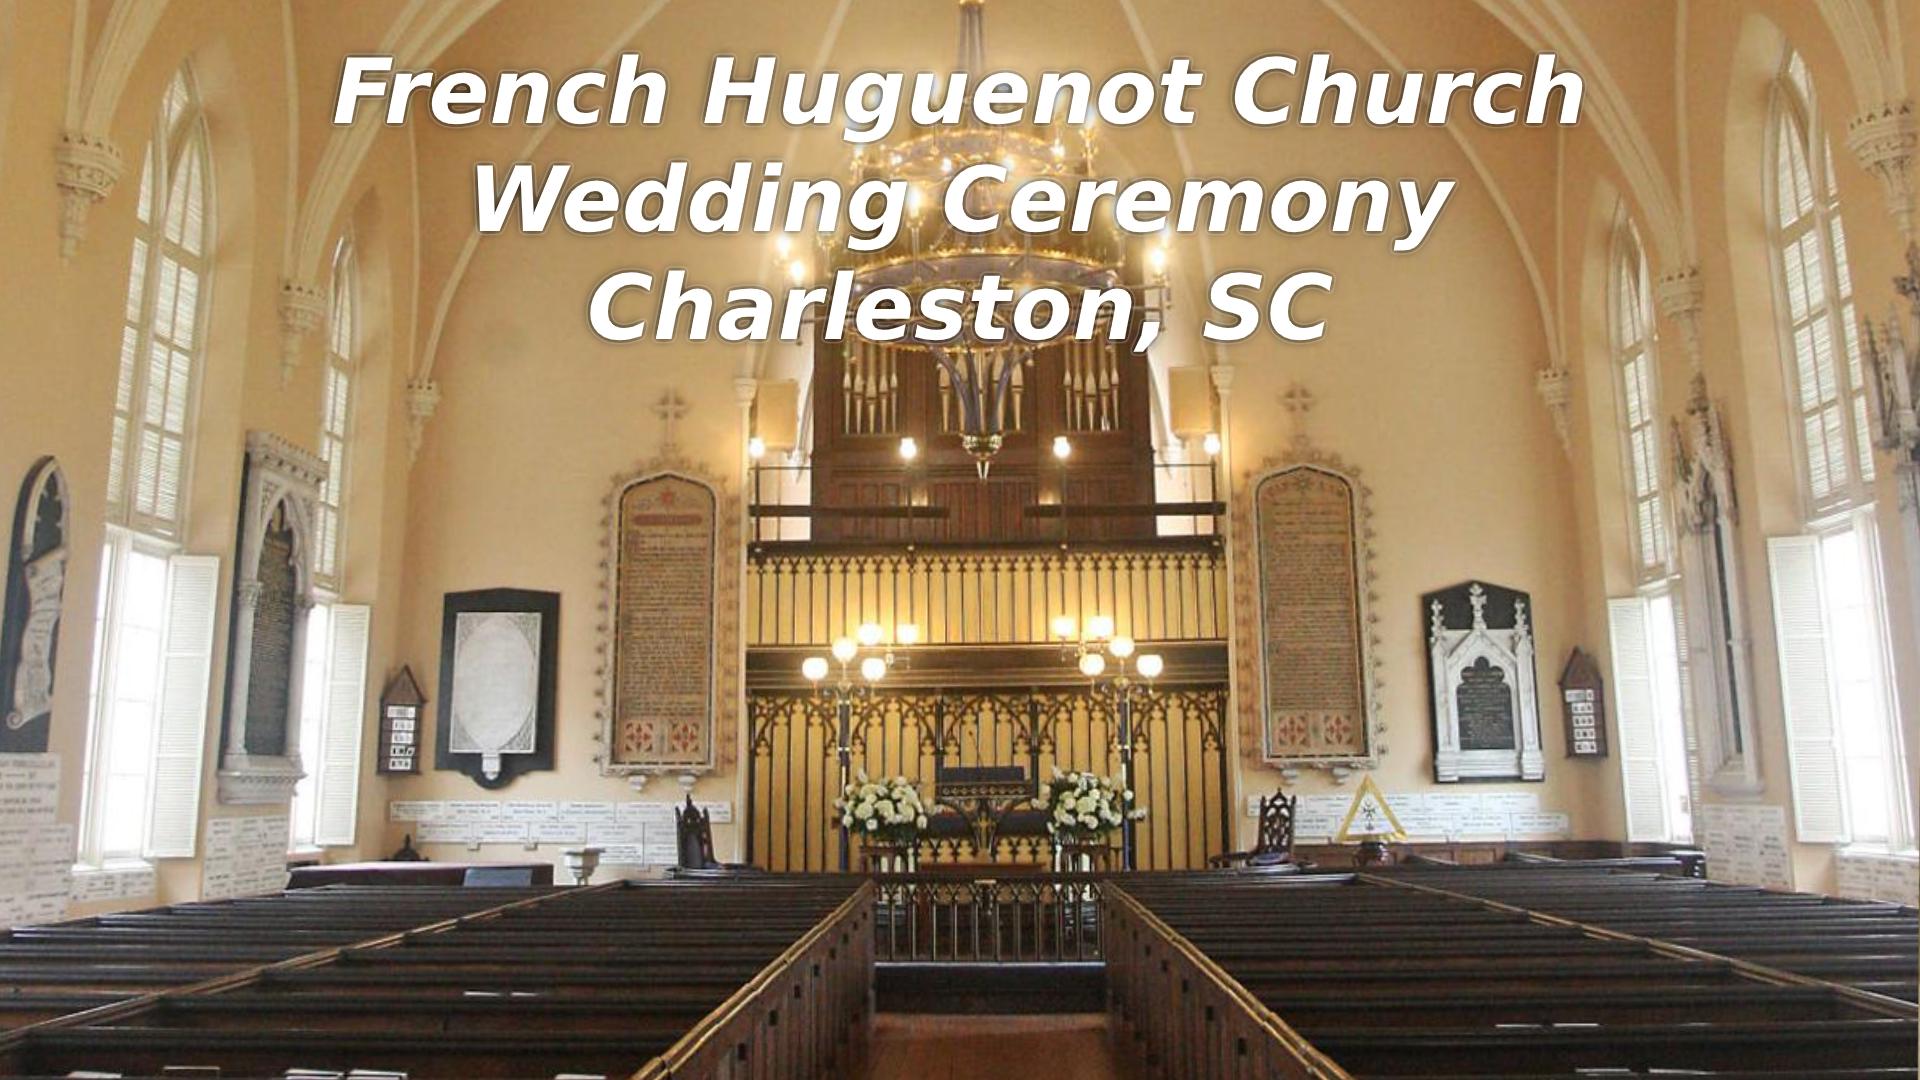 French Huguenot Church